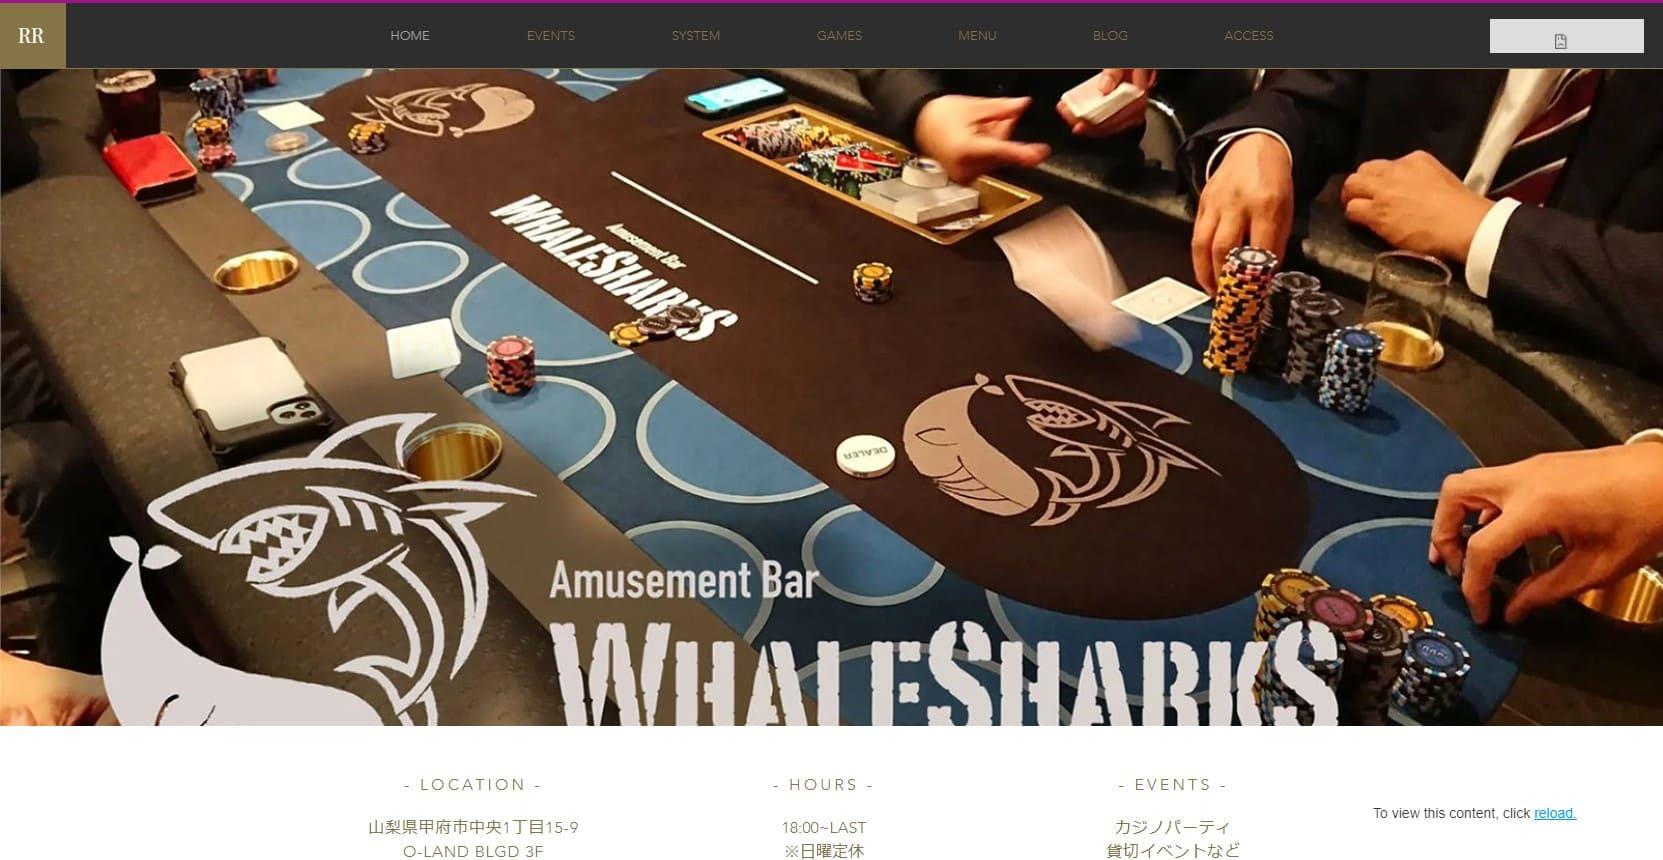 WHALE SHARKSのウェブサイト画像。